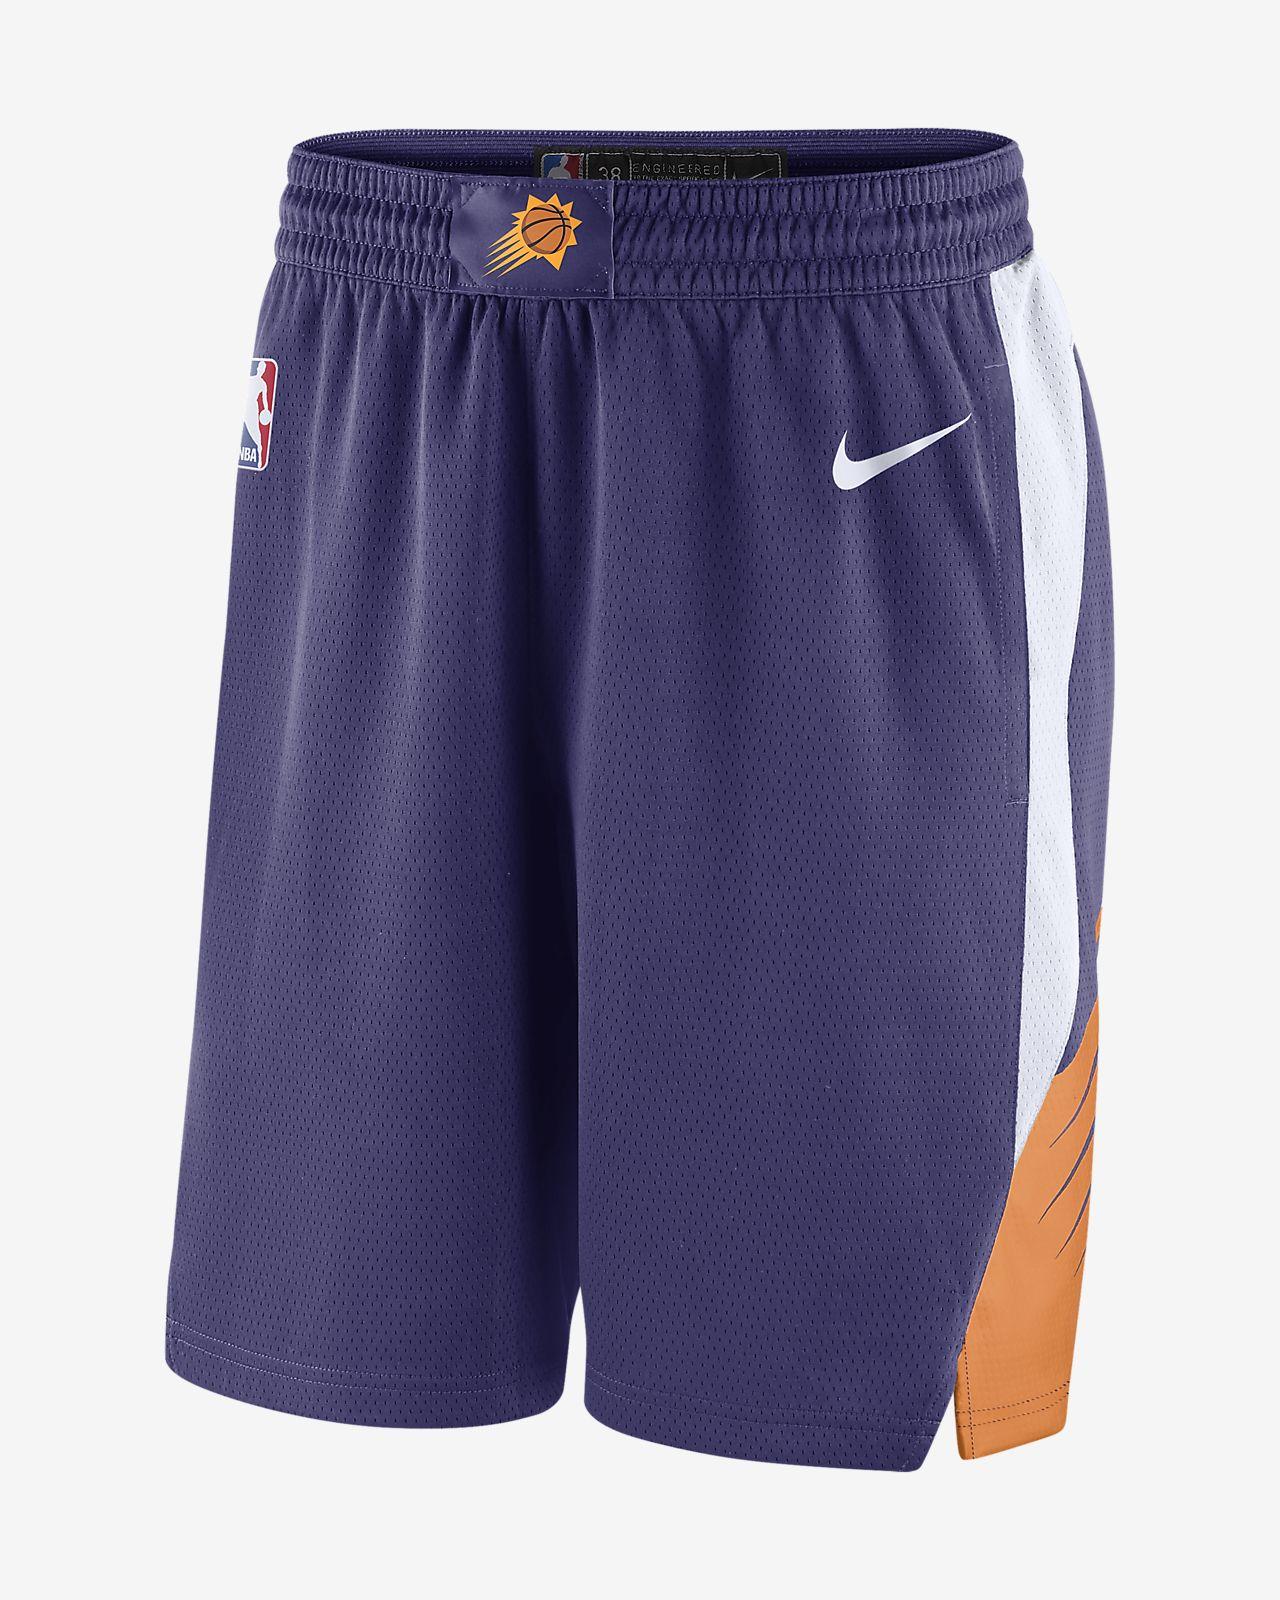 Shorts de la NBA para hombre Phoenix Suns Icon Edition Swingman